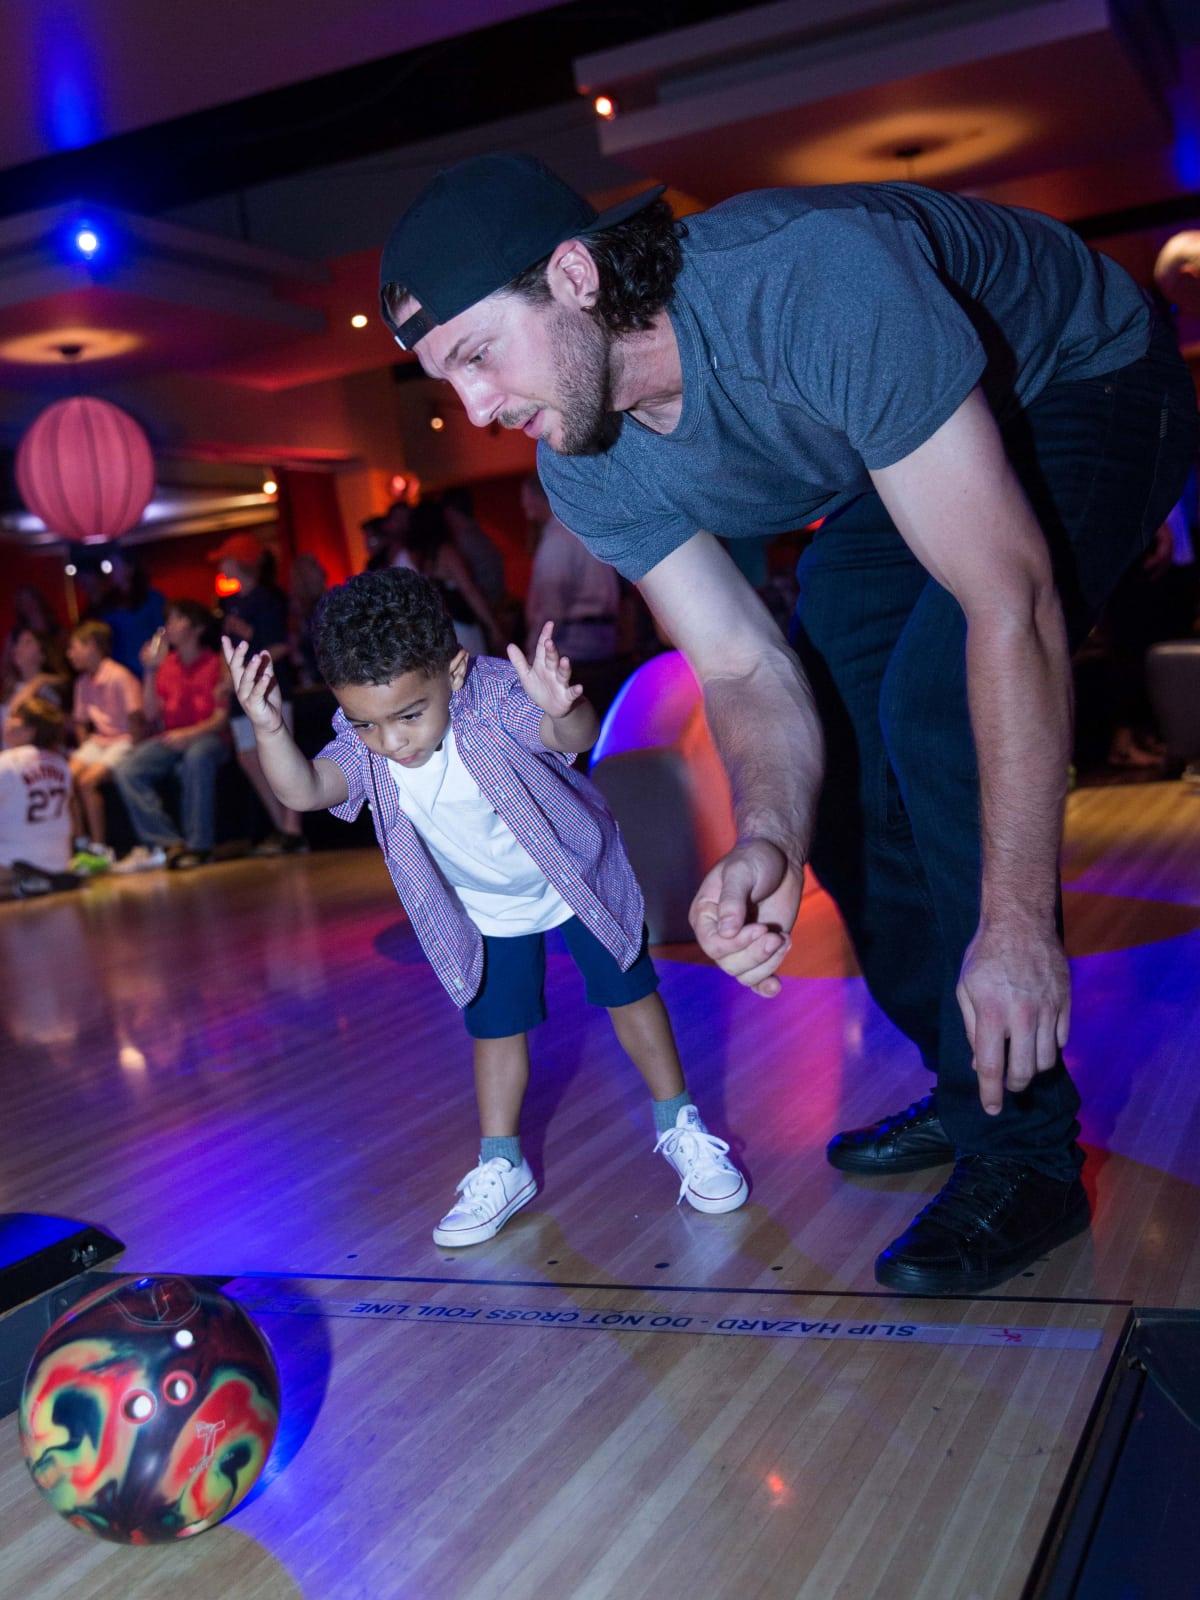 Houston, George Springer All Star Bowling Benefit for Camp Say, June 2017, ,Jake Marisnick